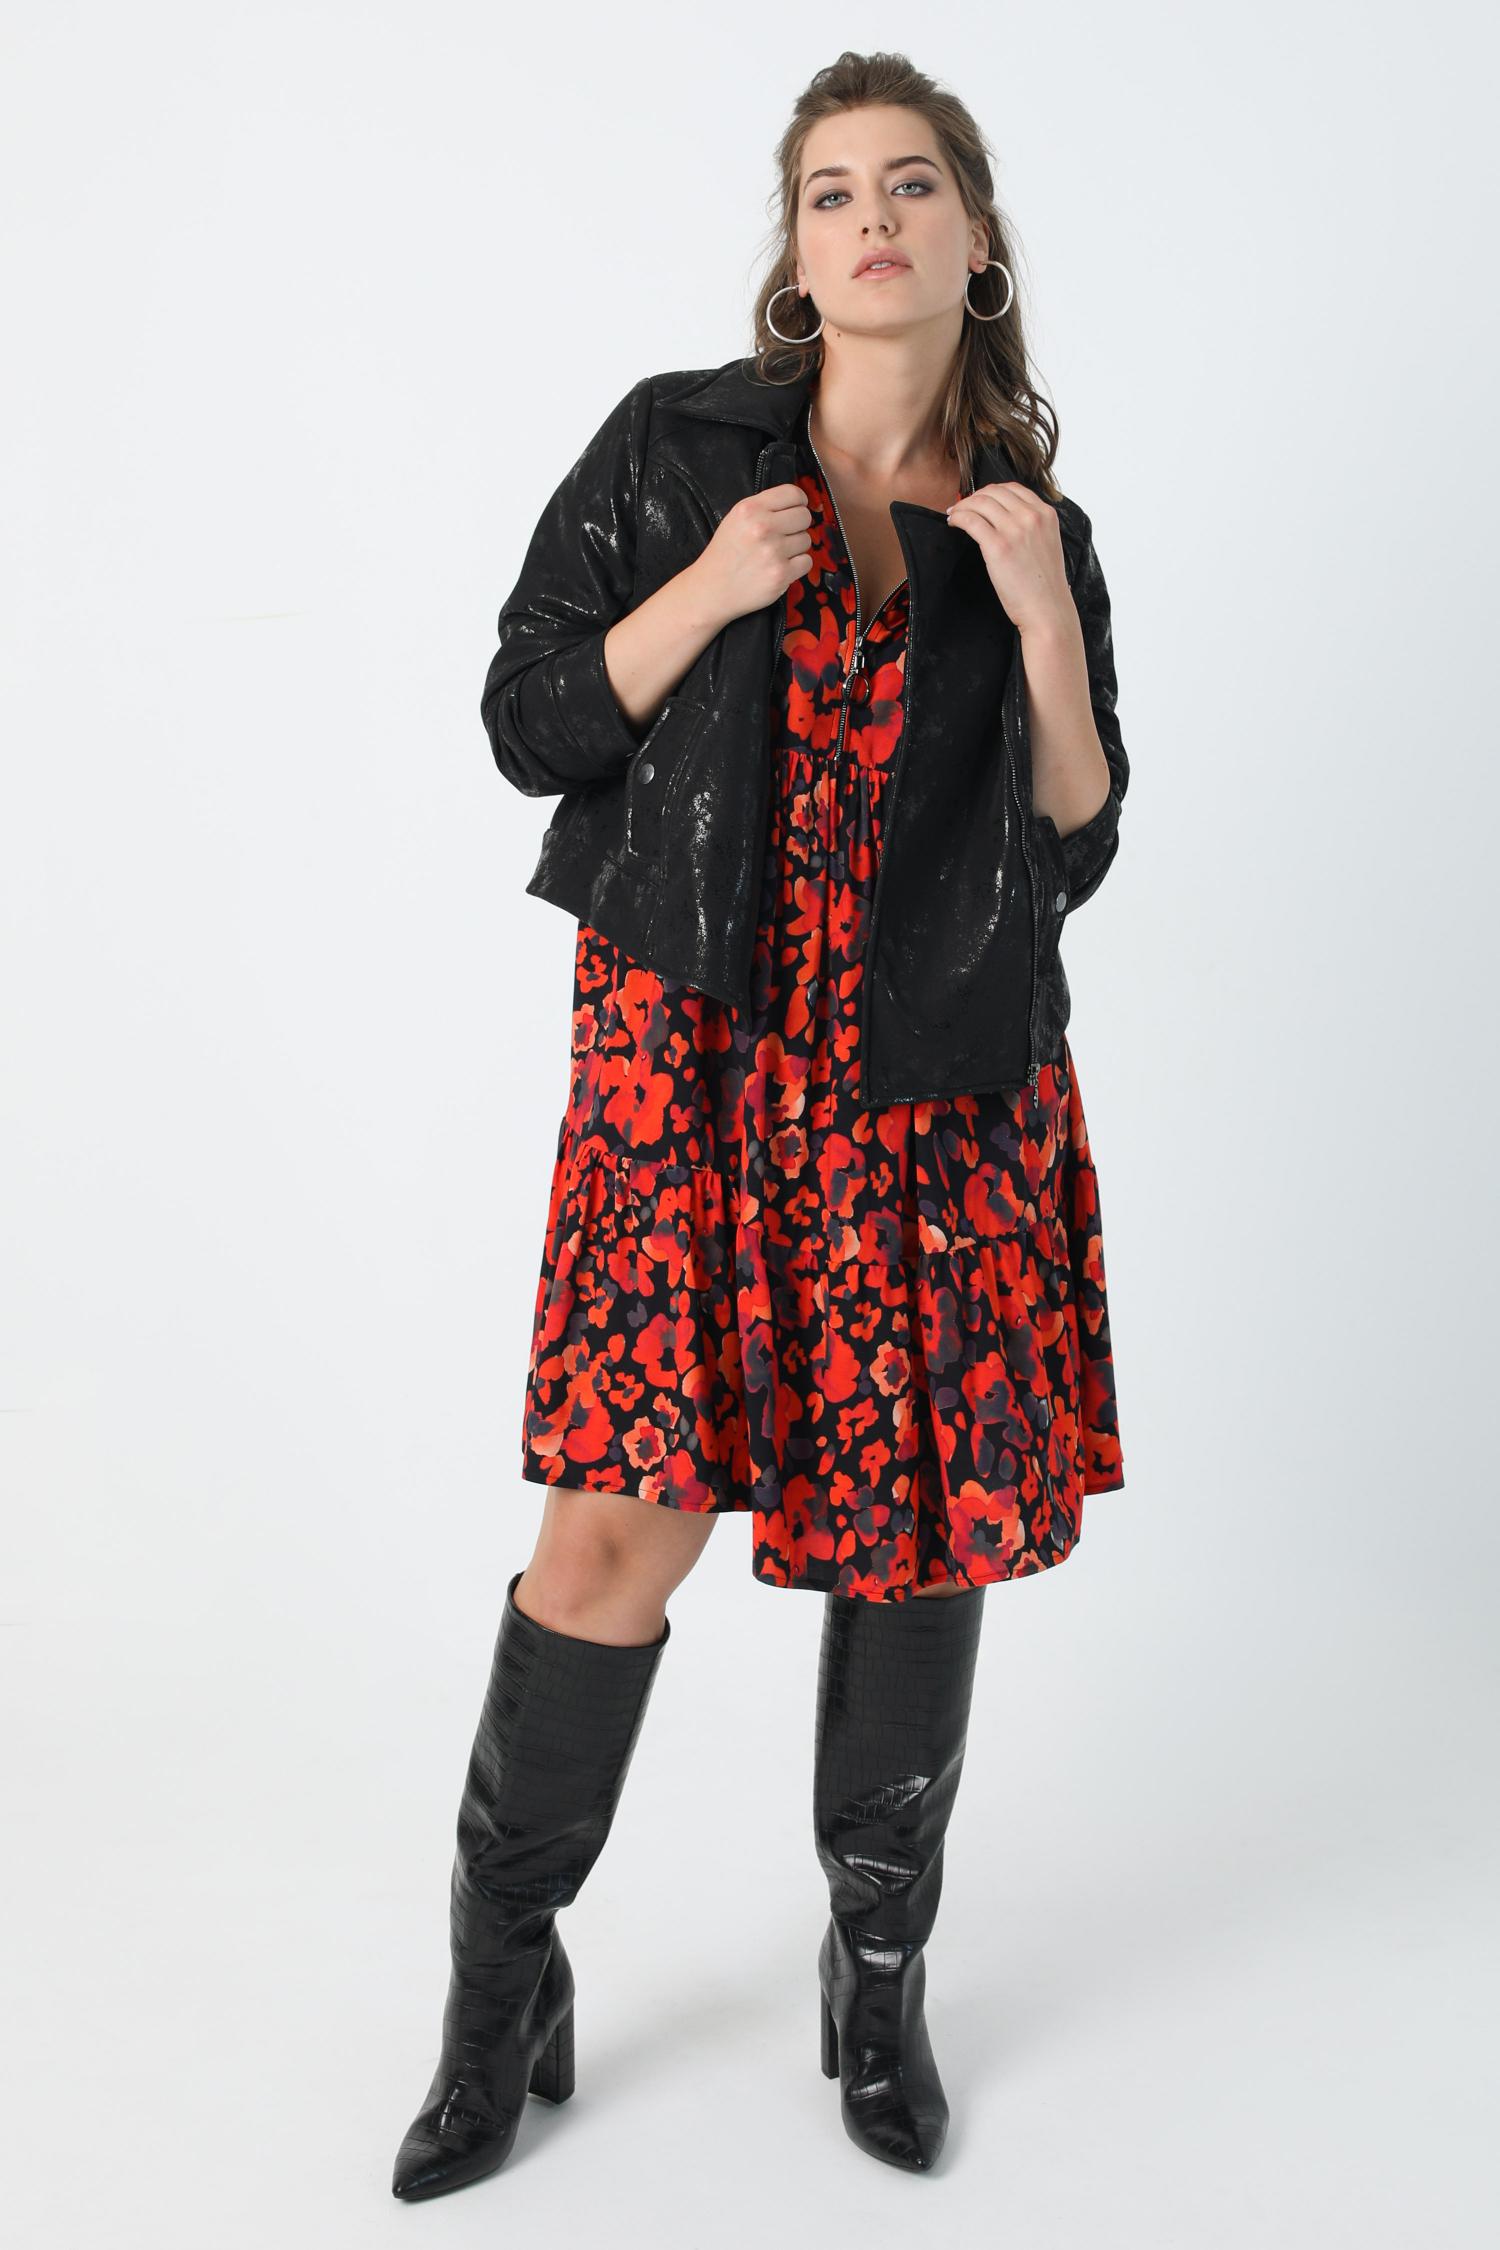 Short biker style jacket (shipping August 15/20)